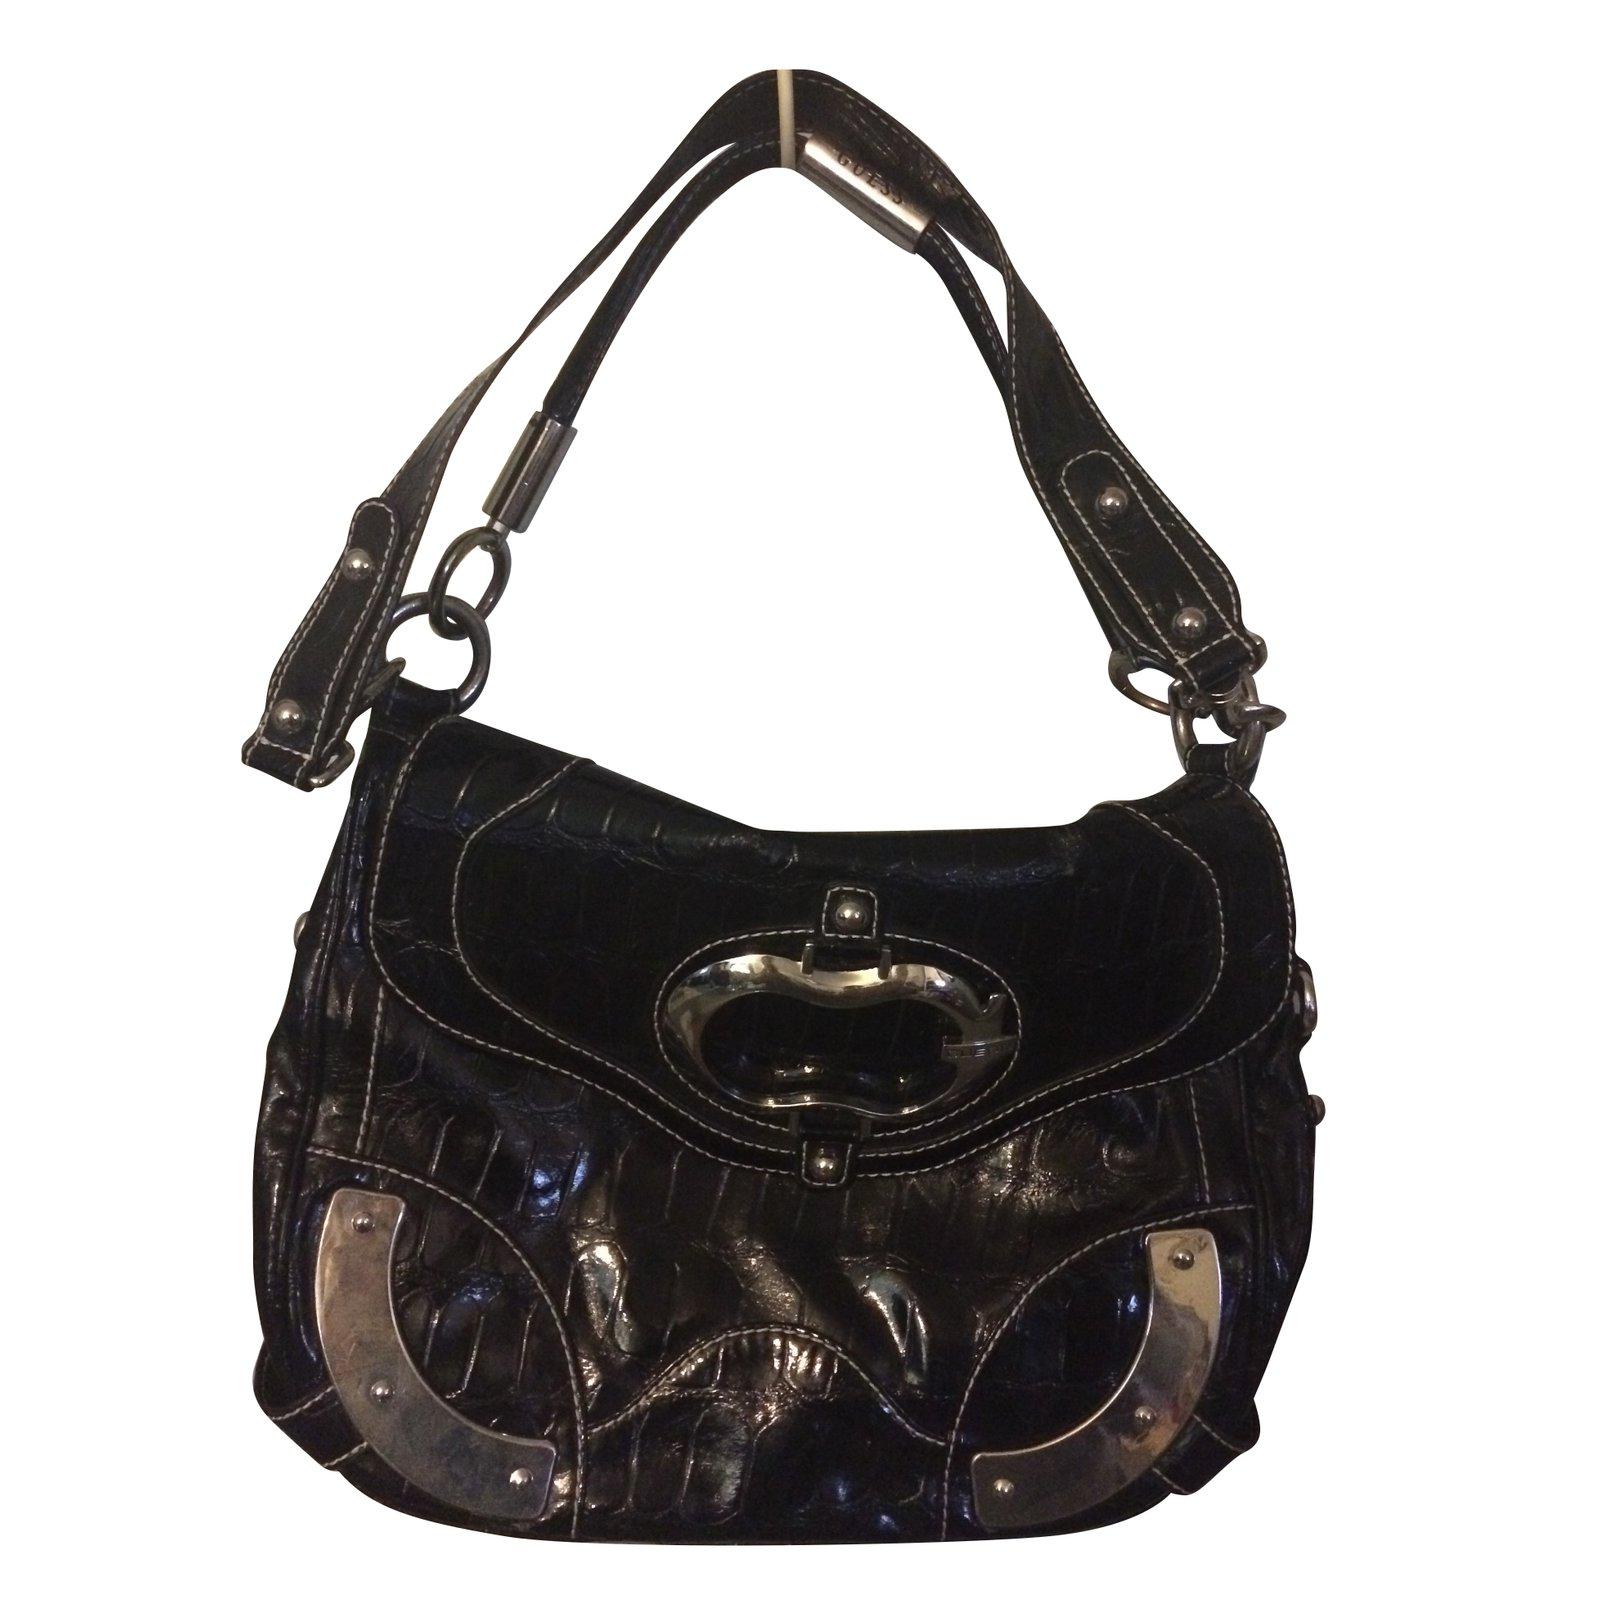 Guess Bag Handbags Leather Black Ref 71837 Joli Closet